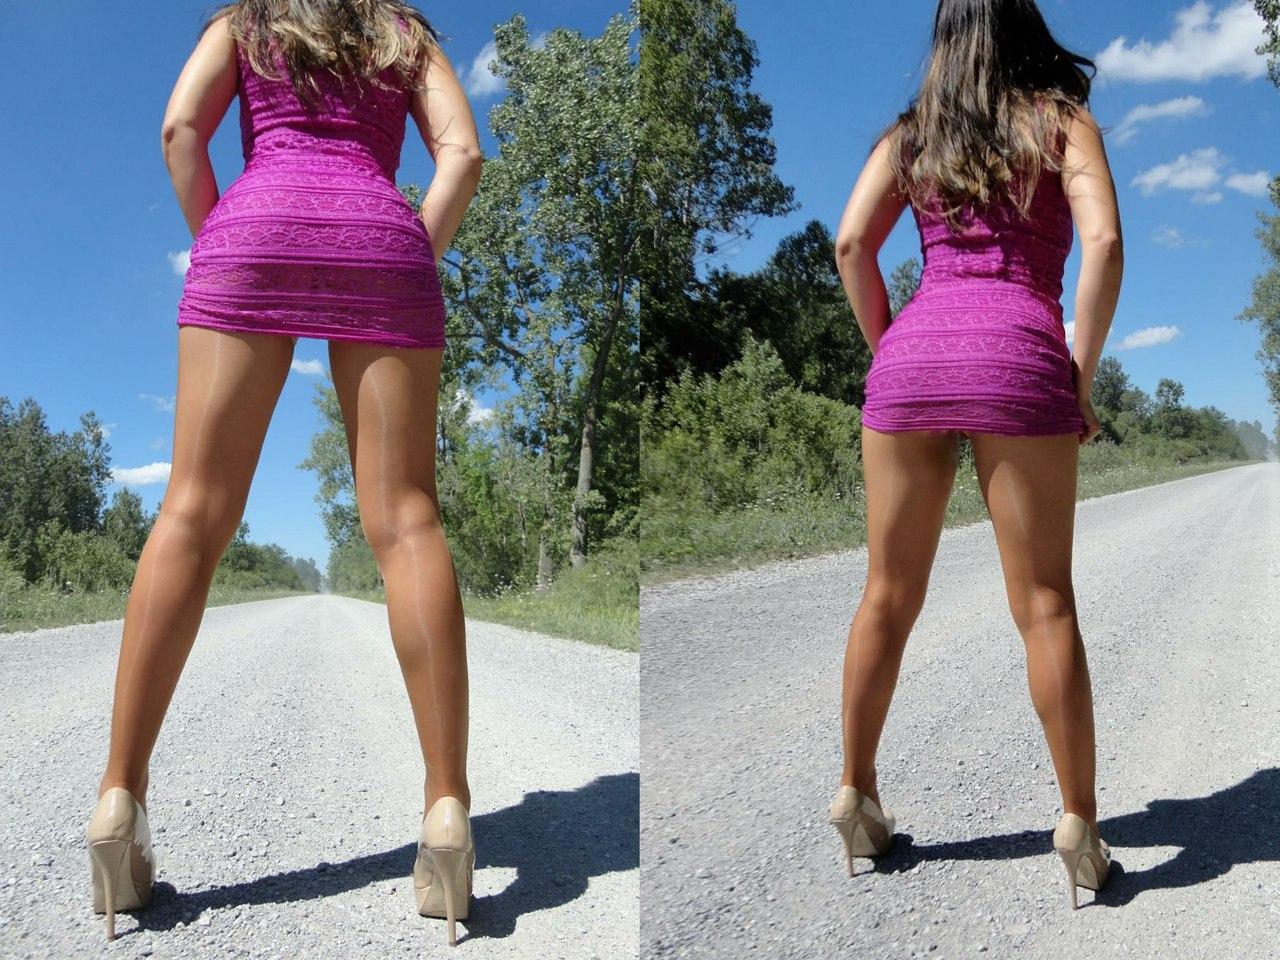 Watch my naked videos click copy